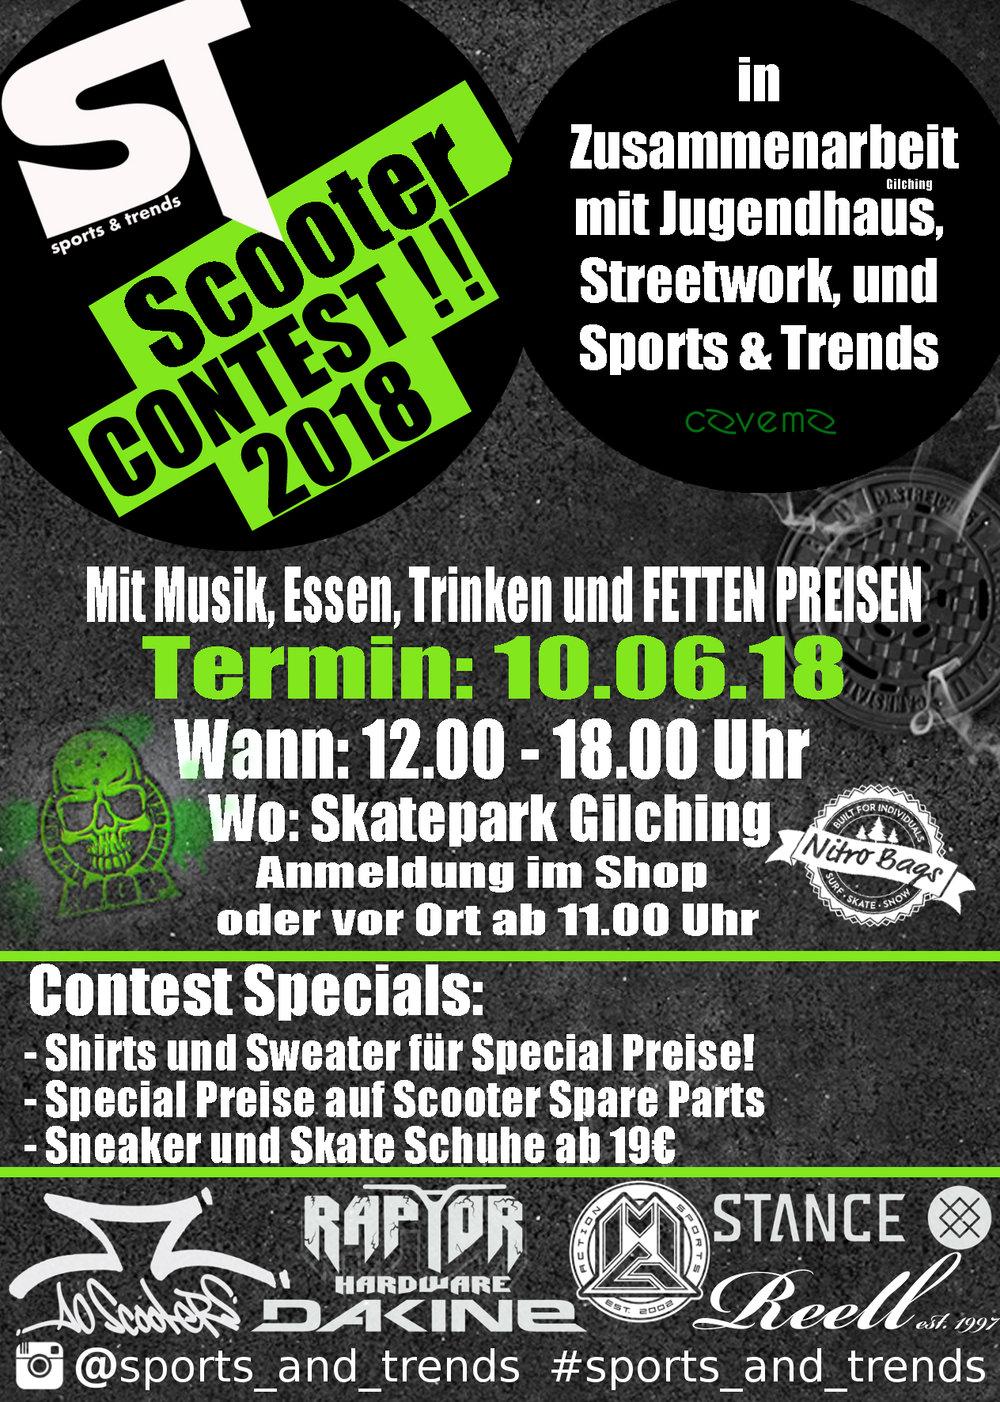 scooter2018 ohne logos_bearbeitet-fihiughnal_bearbeitet-2.jpg